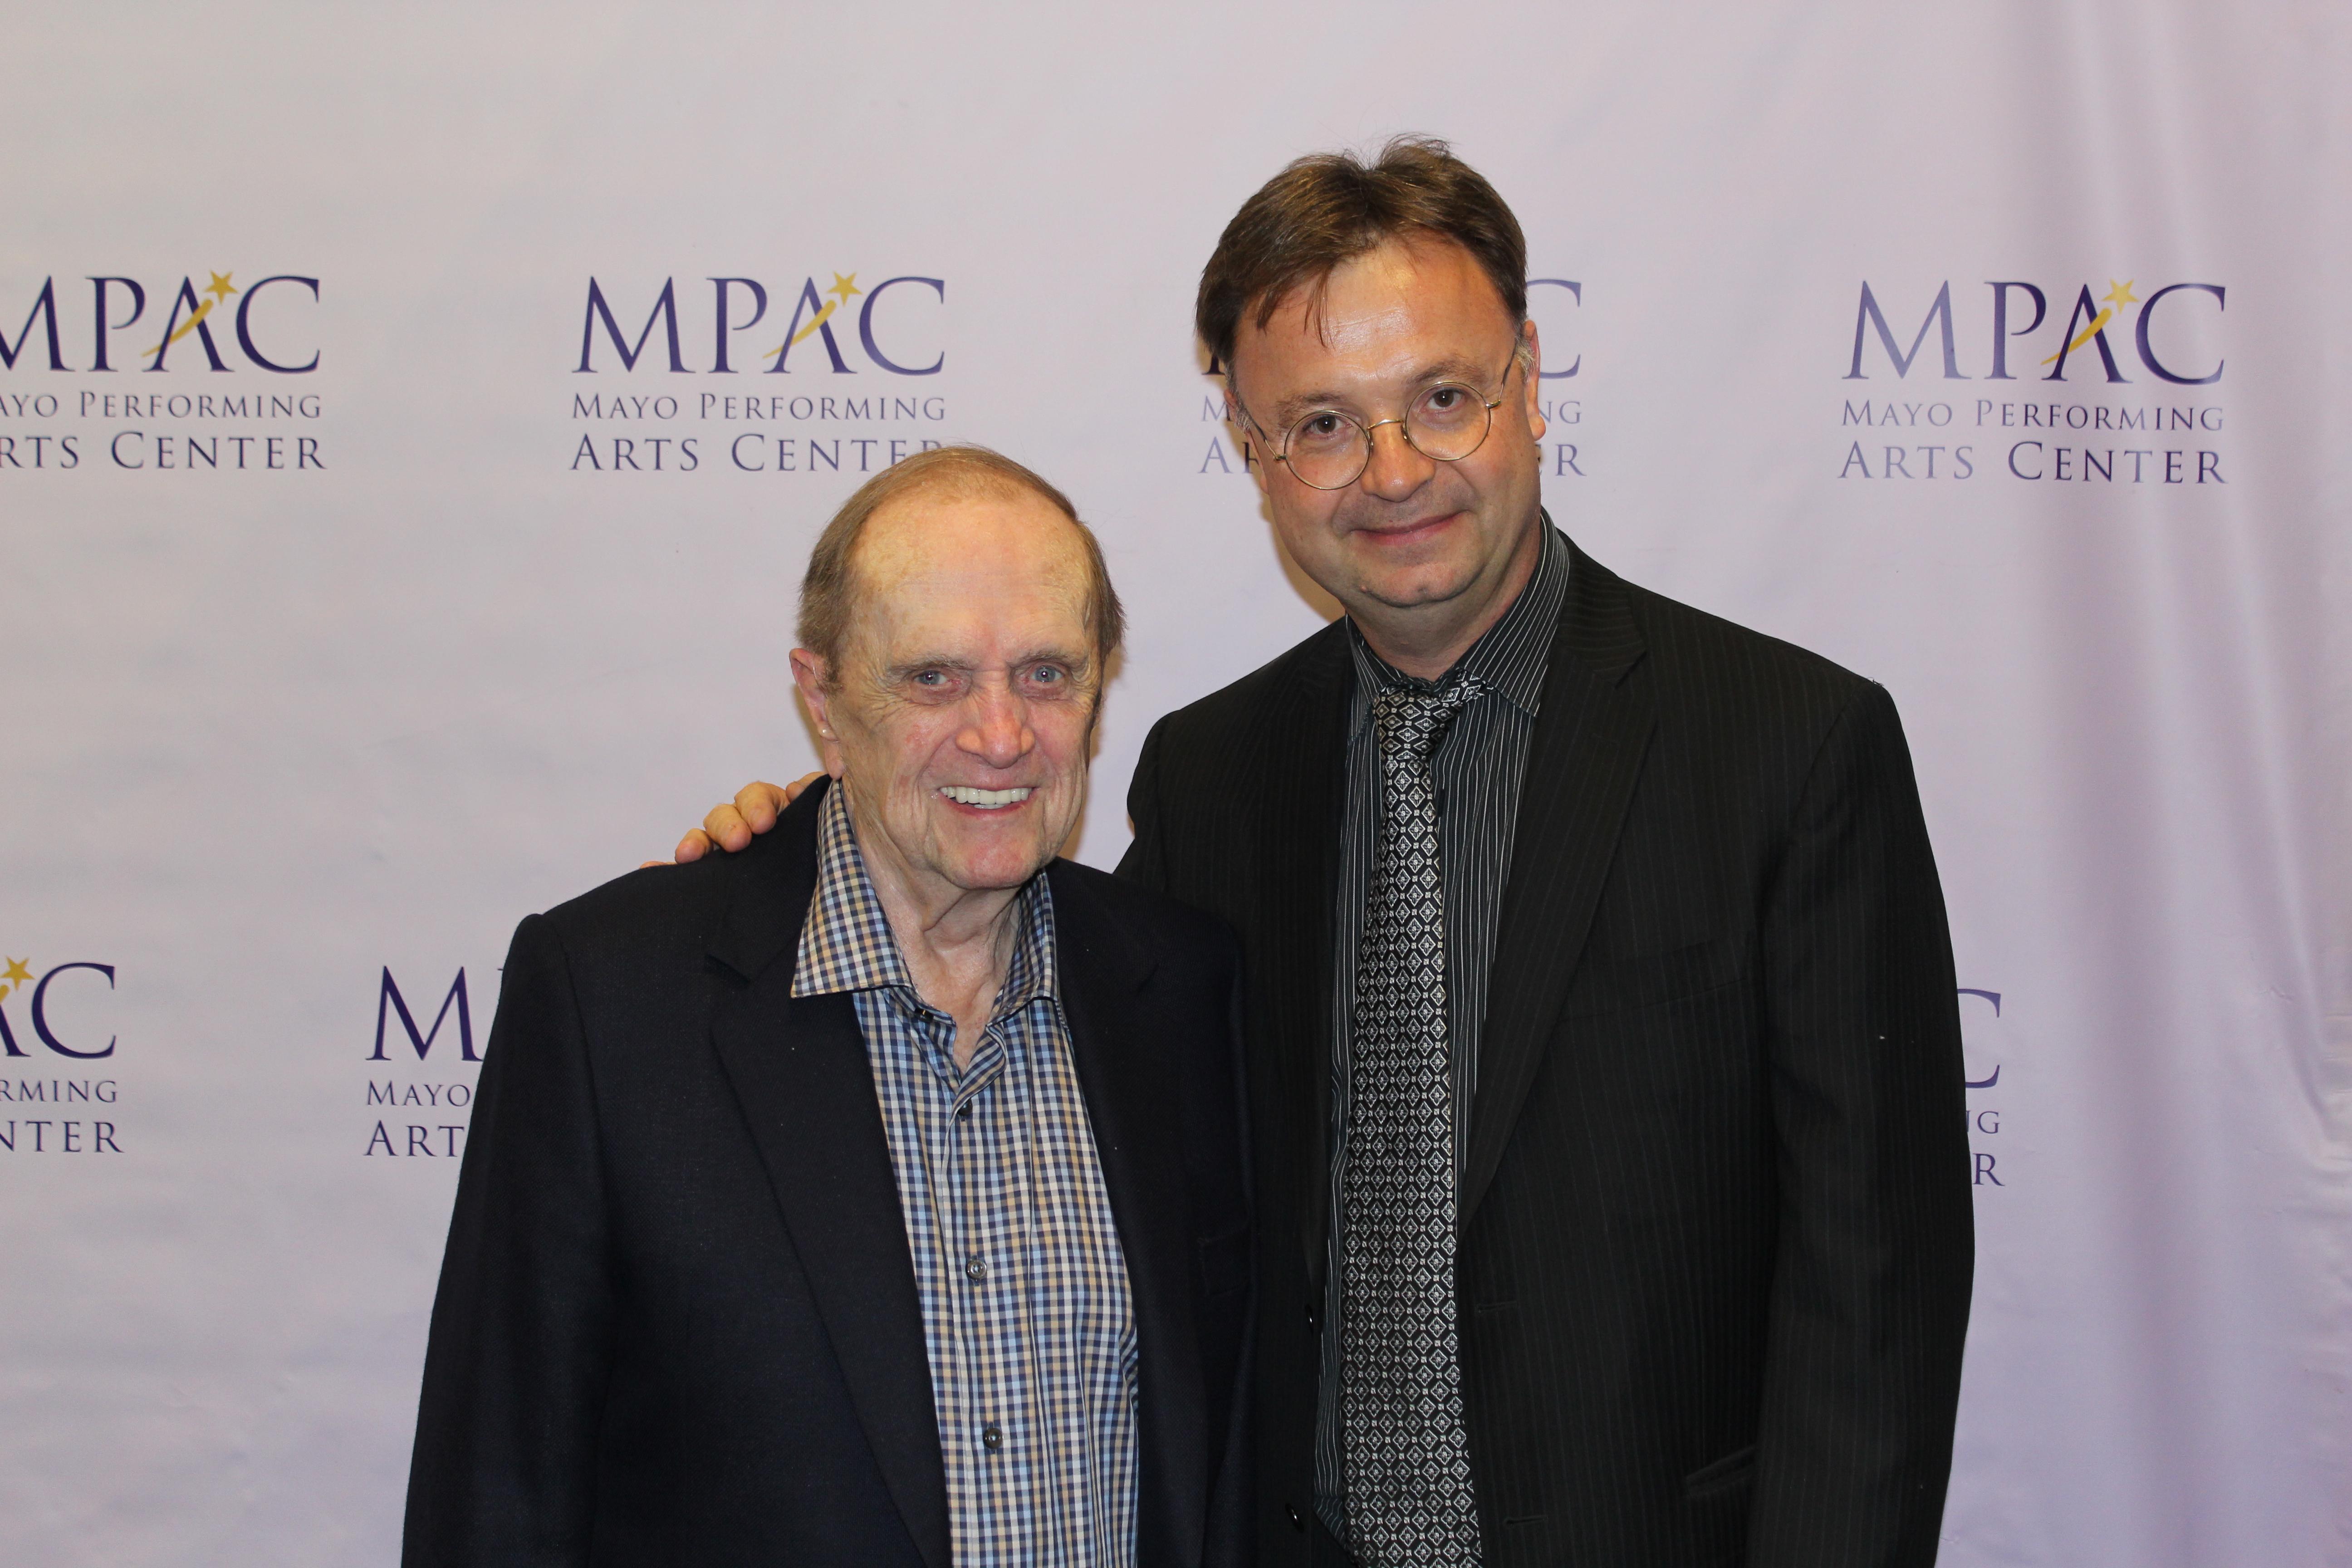 David Wroe with Bob Newhart